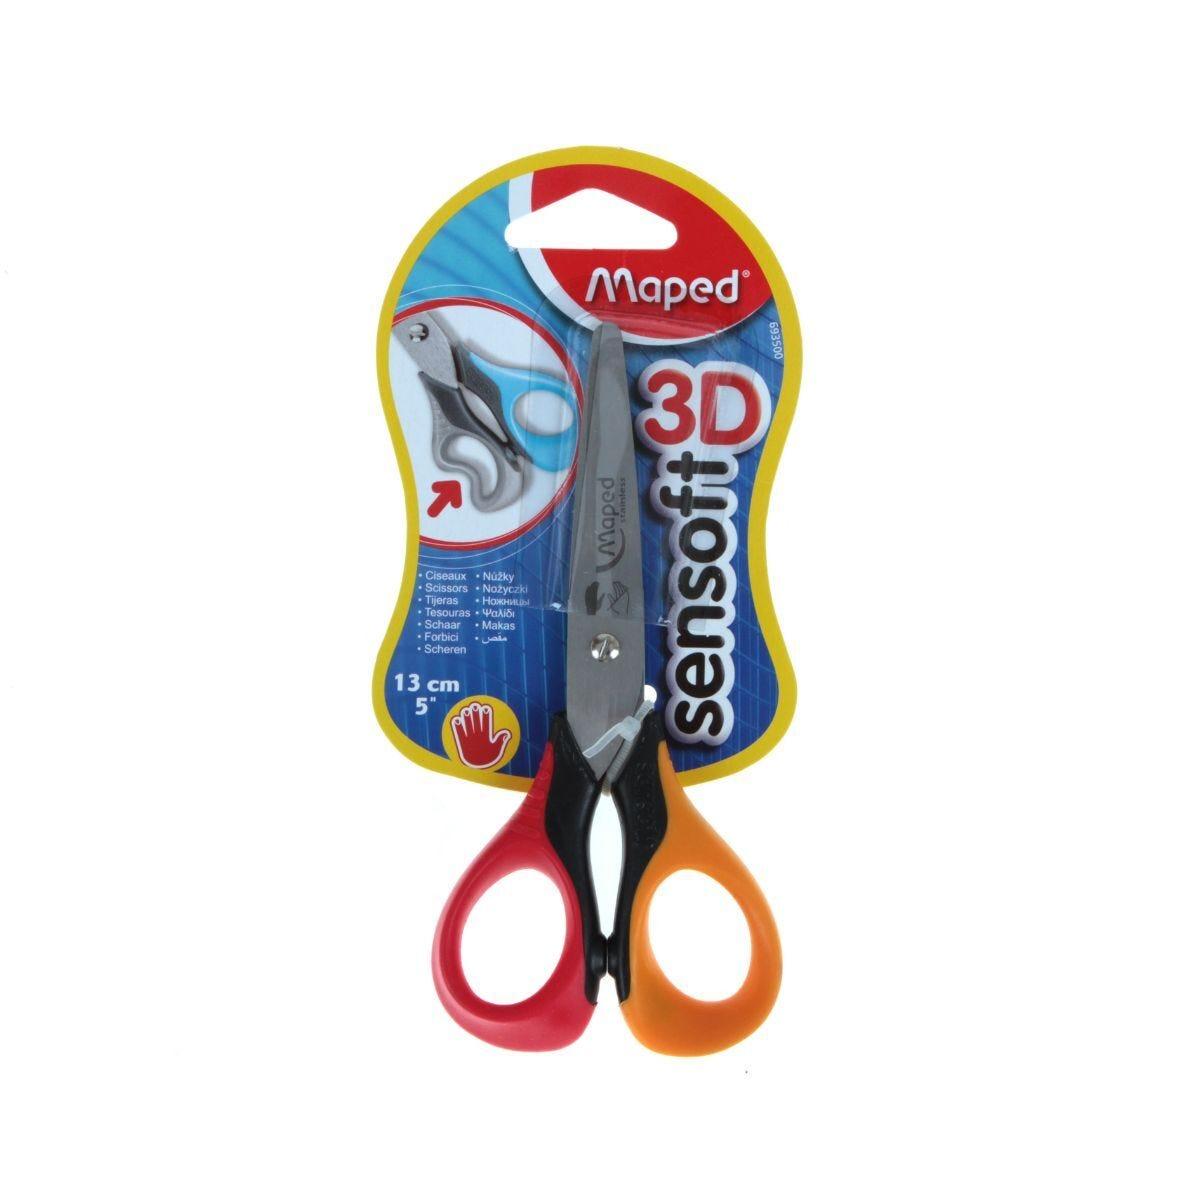 Maped Sensoft 3D Scissors Left Hand 13cm